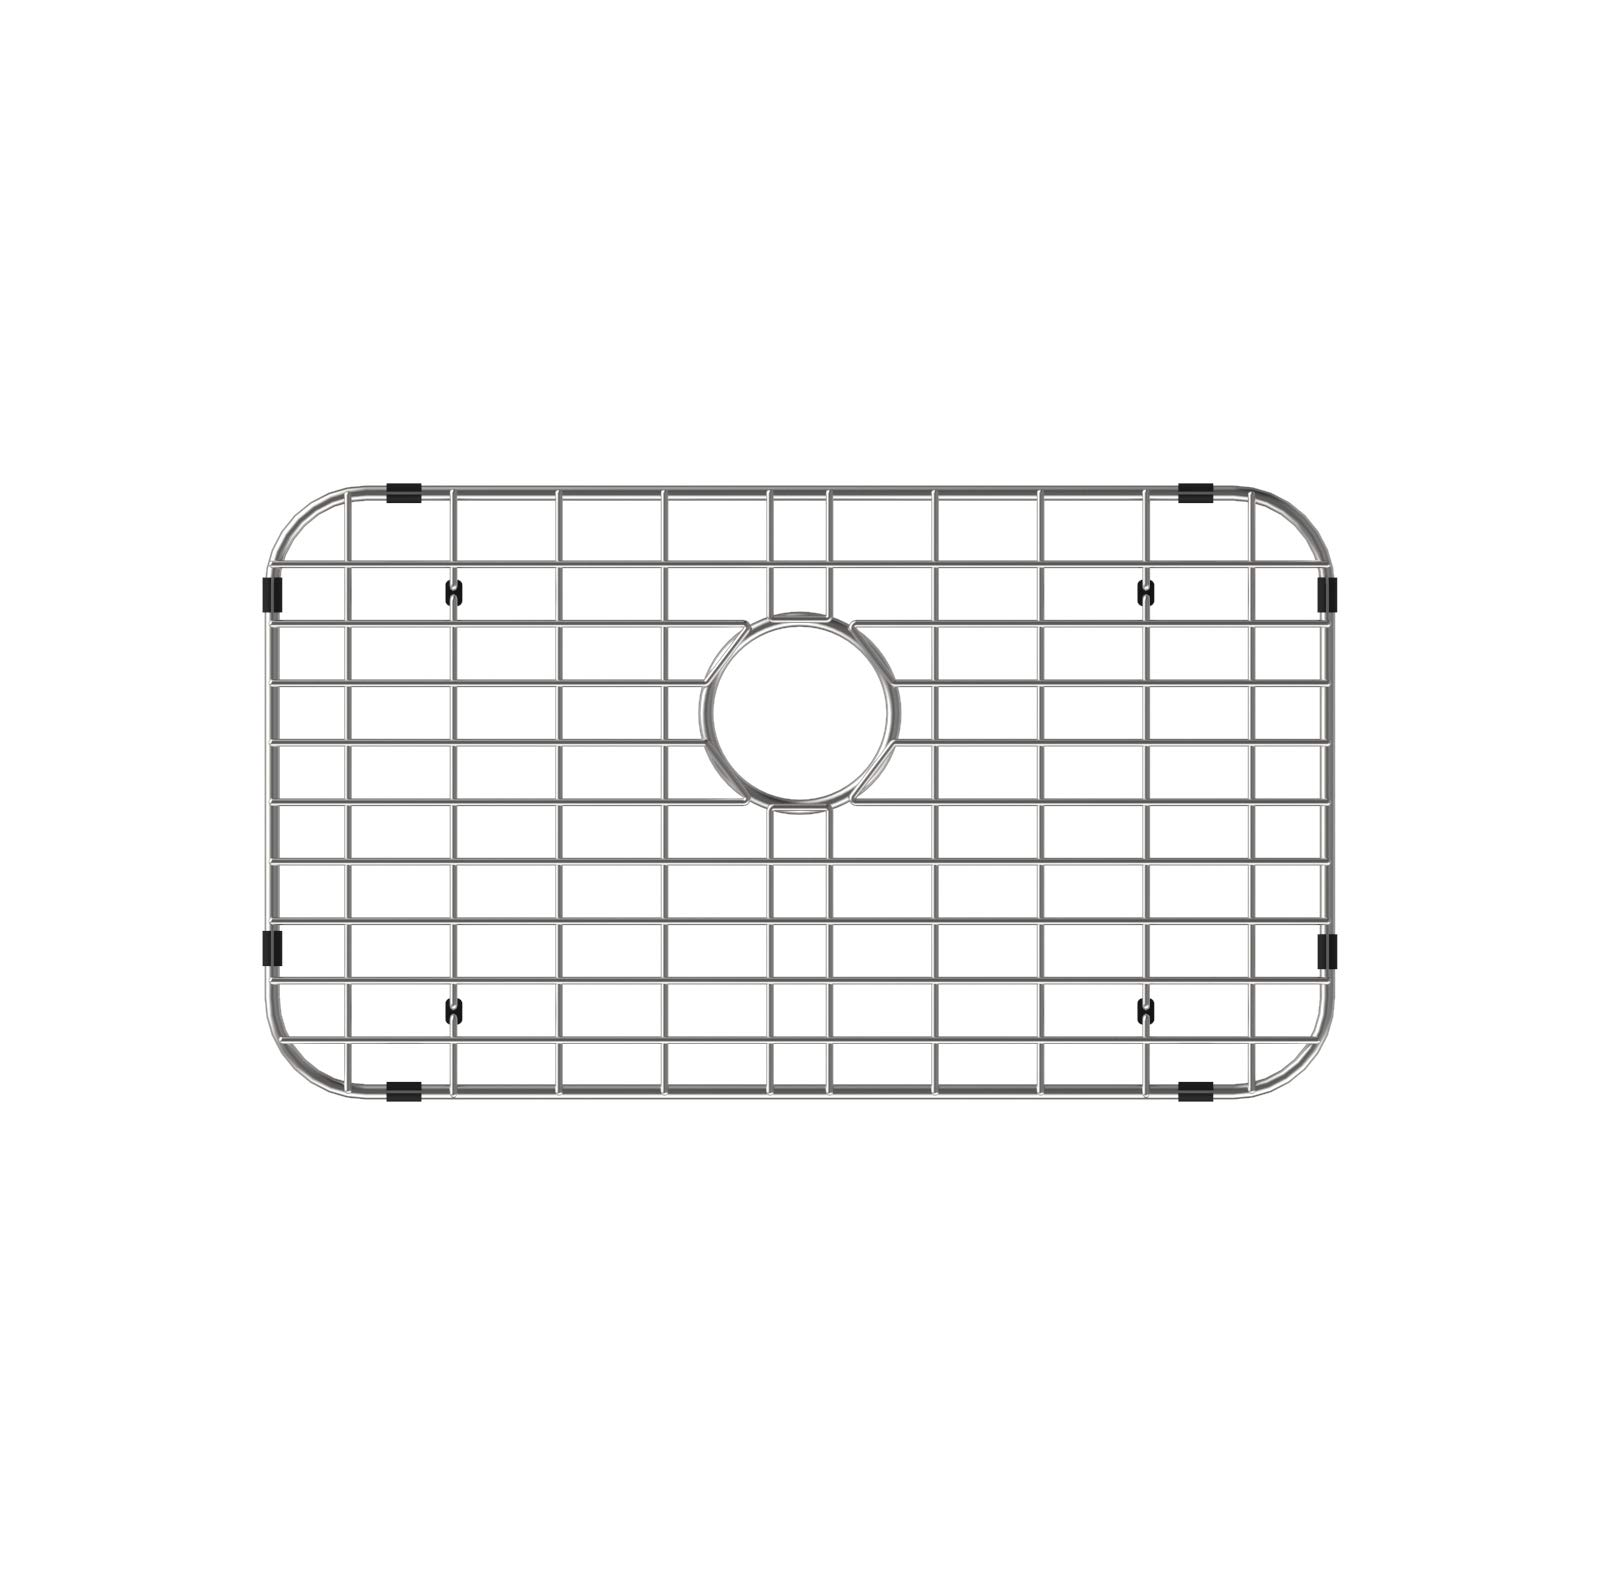 Stainless Steel Kitchen Sink Grid (30Wx18L)